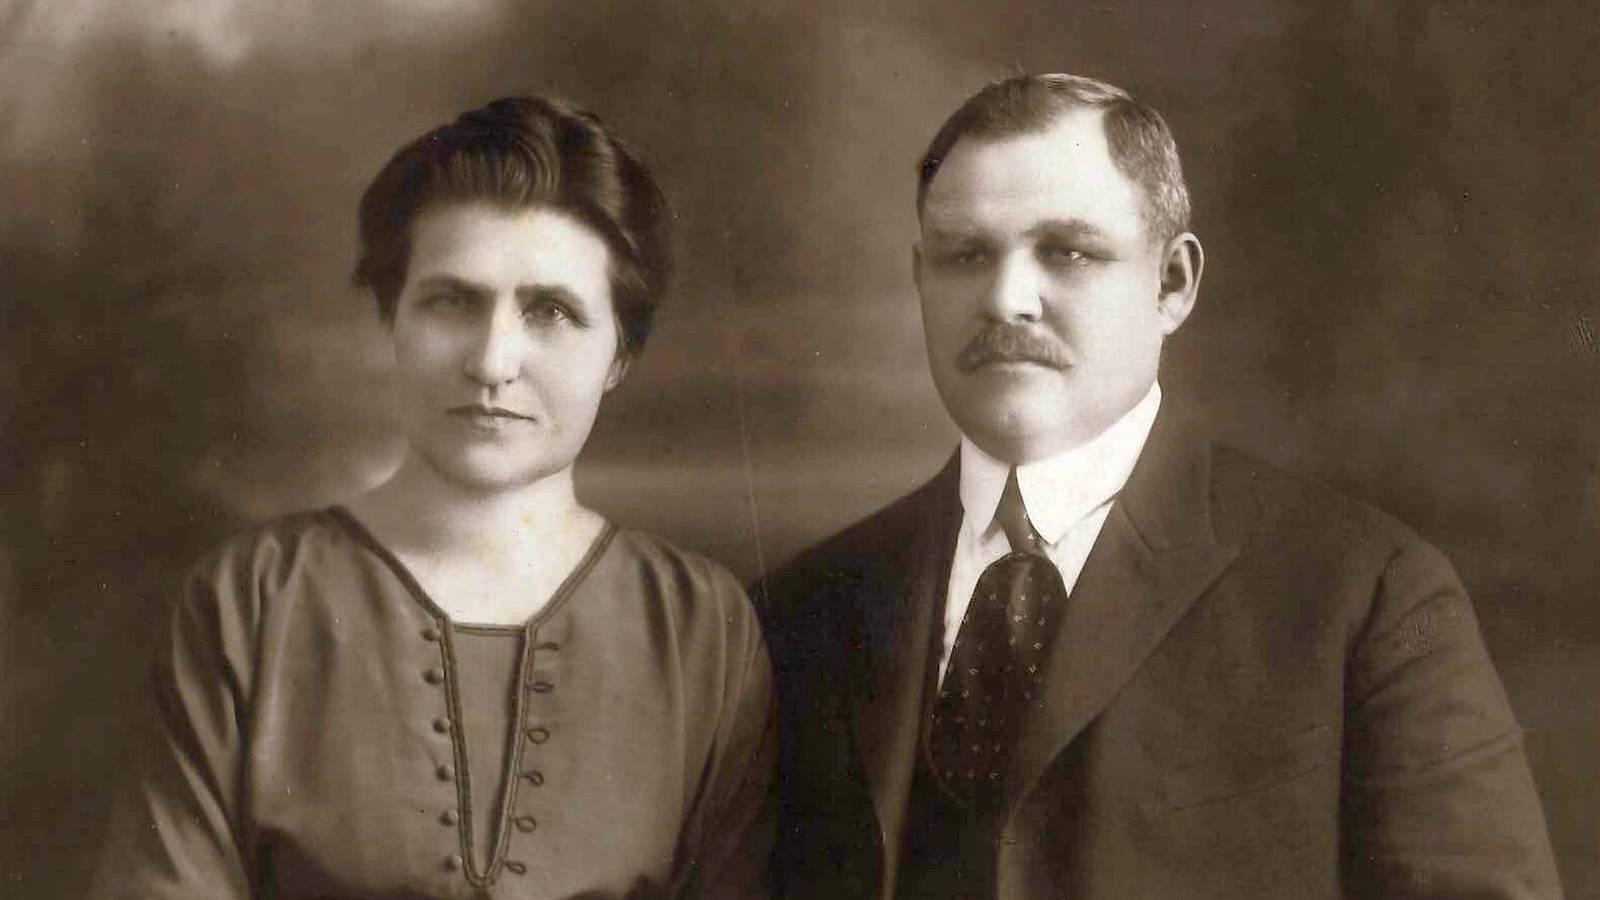 Adam ?i Lydia Sezonov - 1915